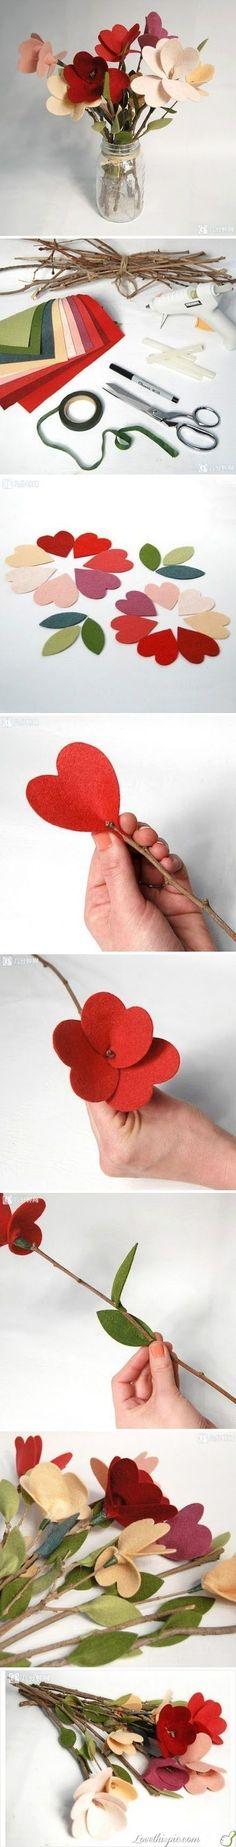 DIY felt flowers flowers diy crafts home made easy crafts craft idea crafts ideas diy ideas diy crafts diy idea do it yourself diy projects diy craft handmade felt